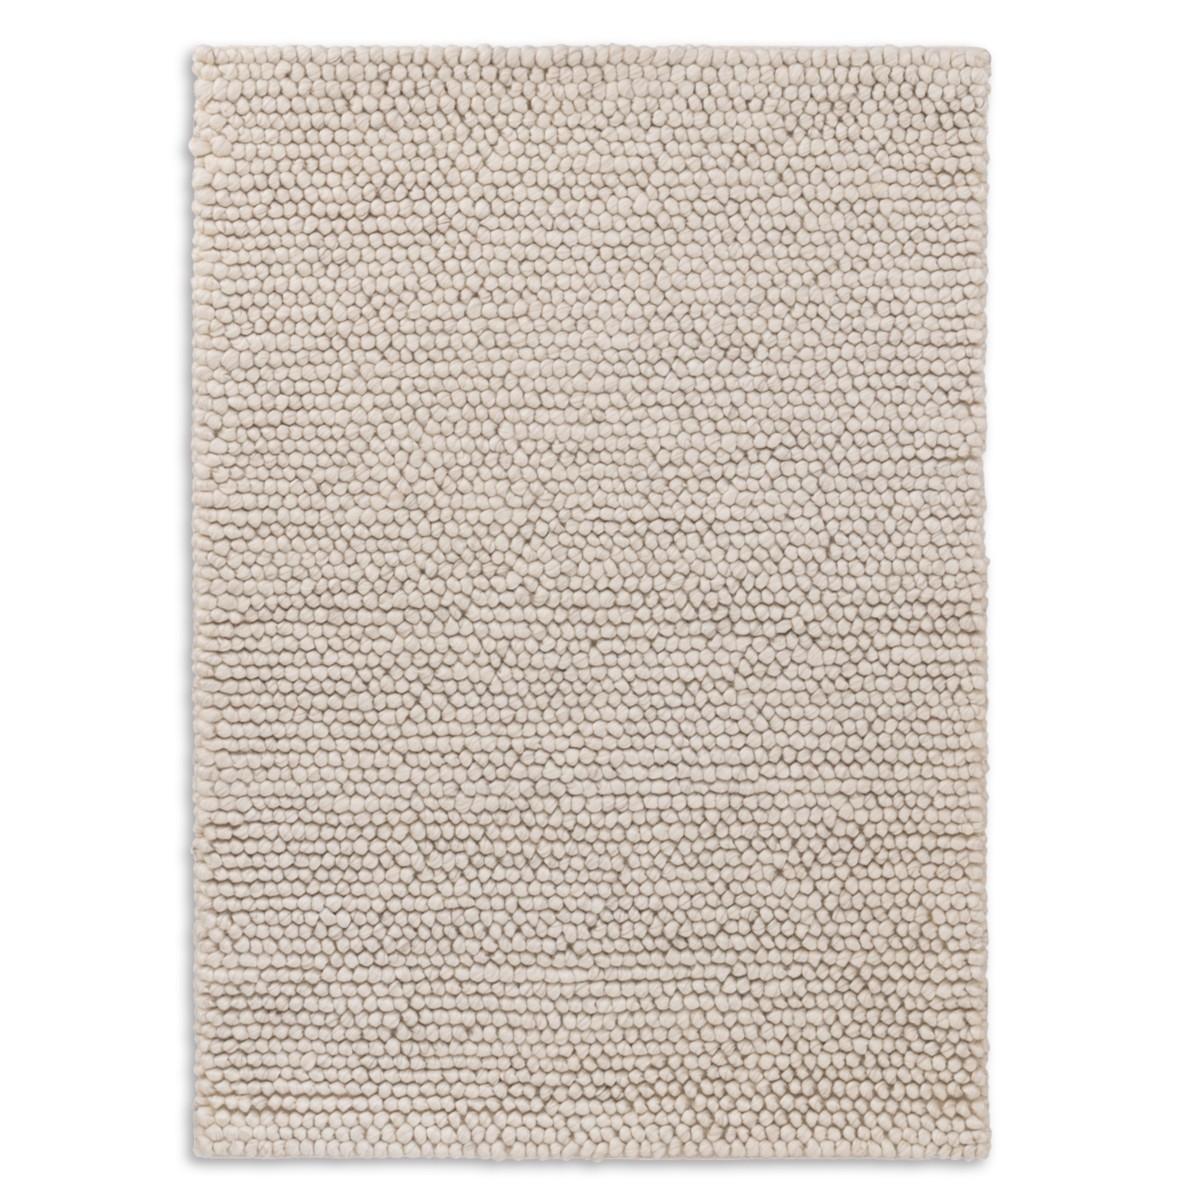 Niels Woven Wool/Viscose Rug - Ivory